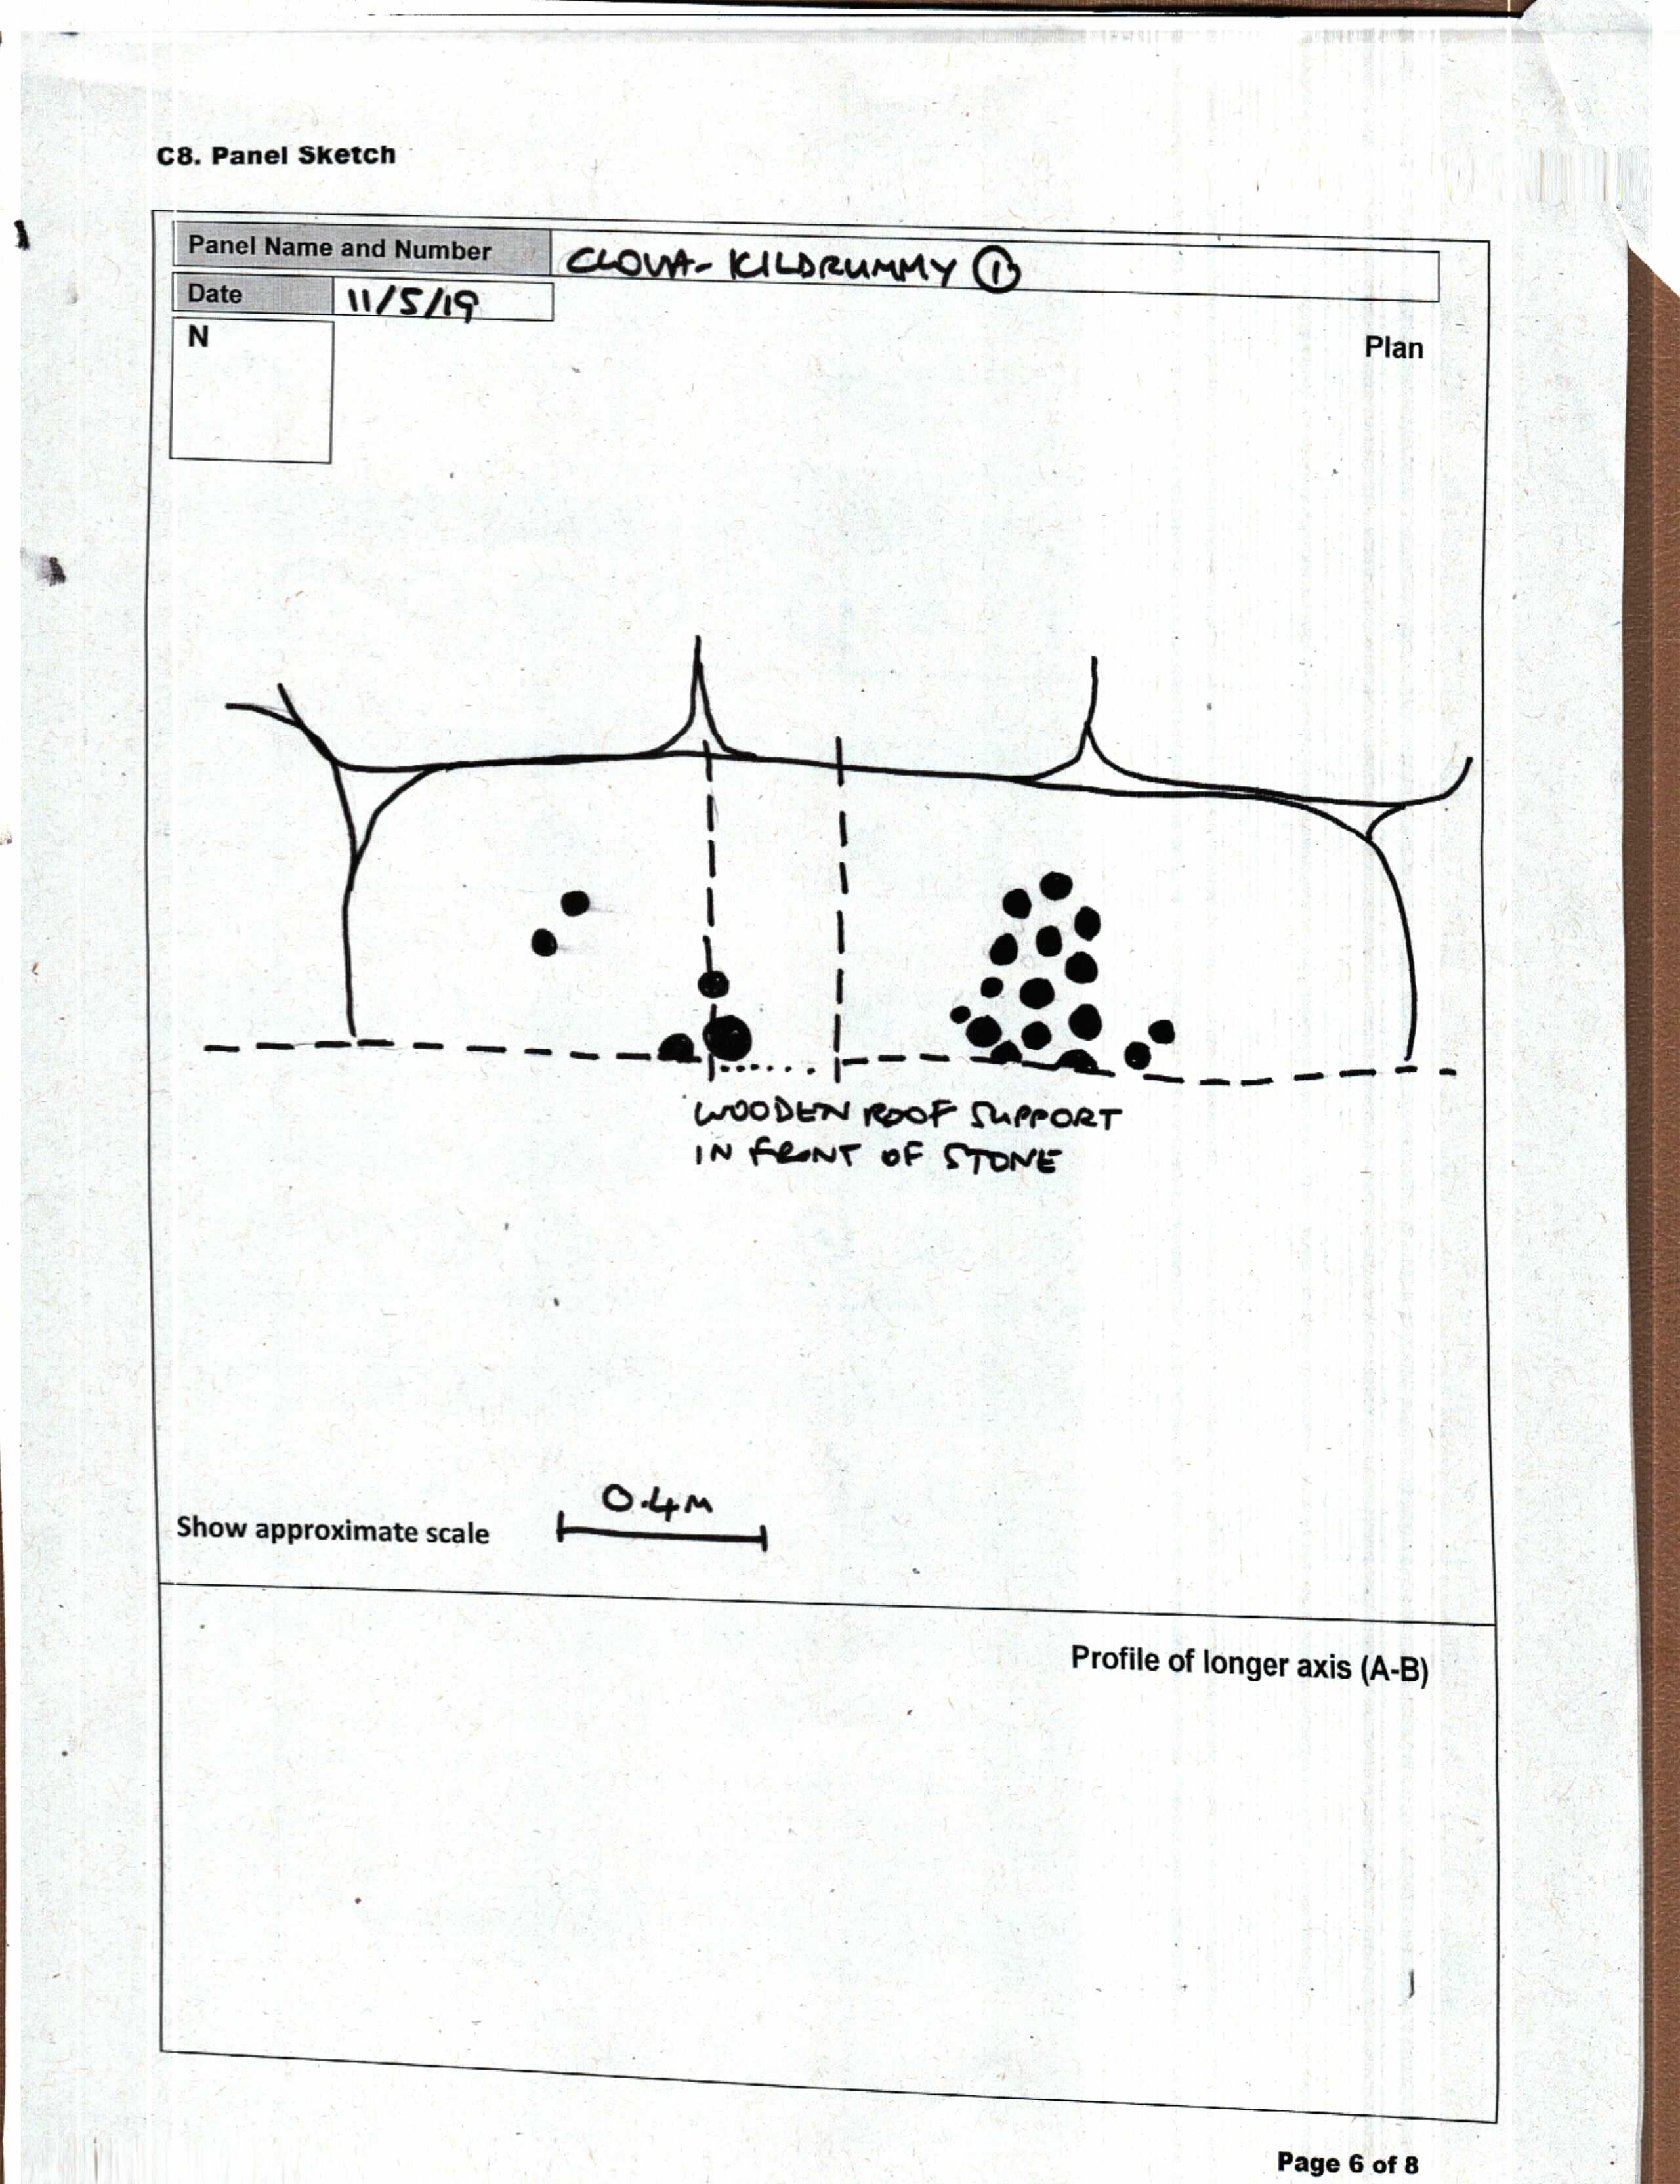 CLOVA, KILDRUMMY 1: Panel Sketch